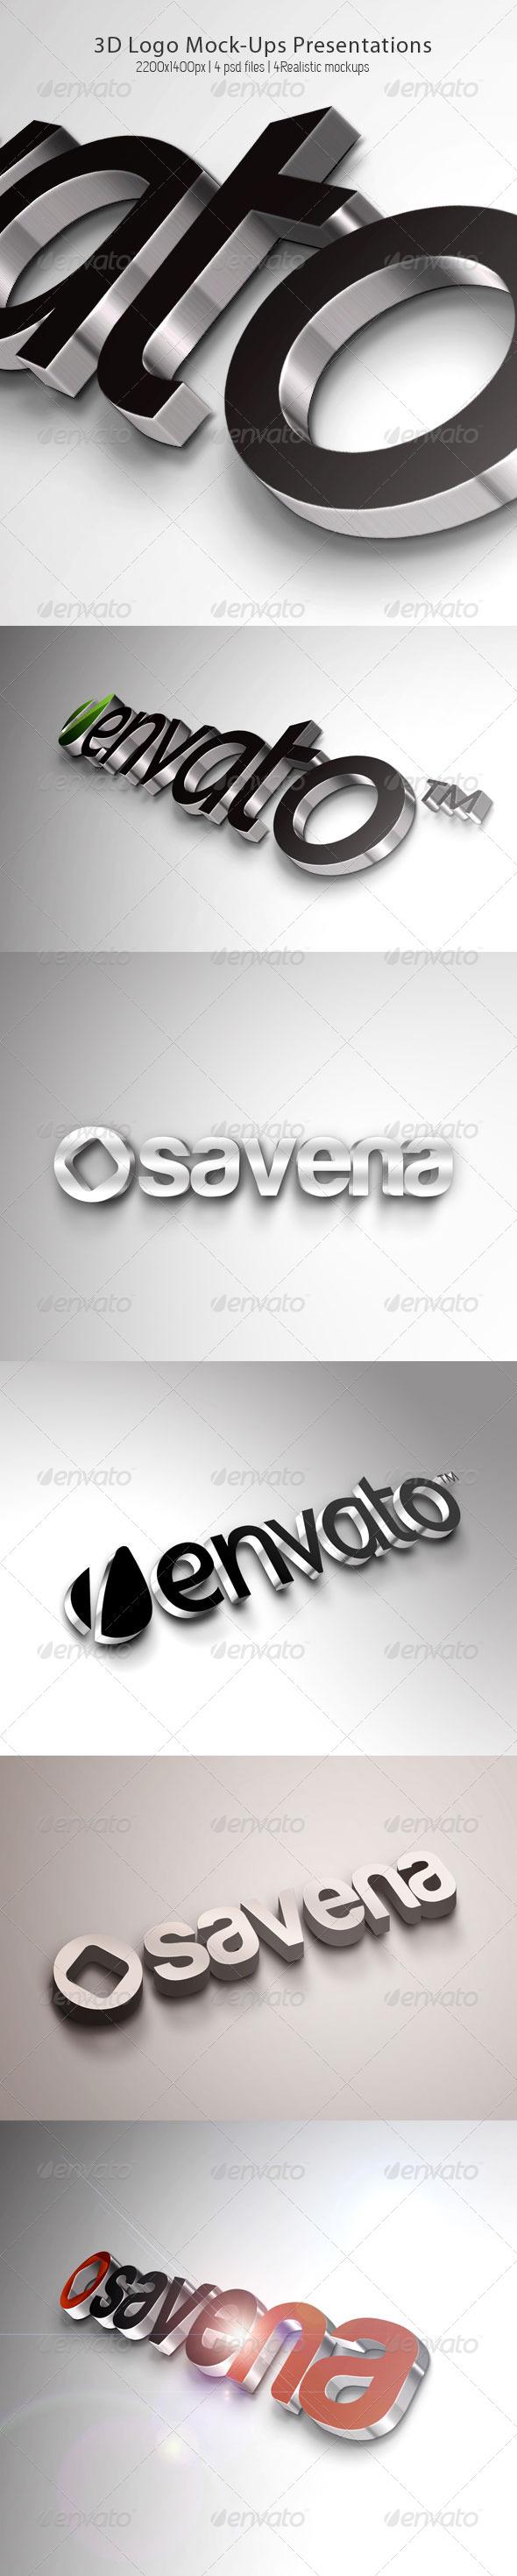 GraphicRiver 3D Logo Mock-Ups Presentations 4577738